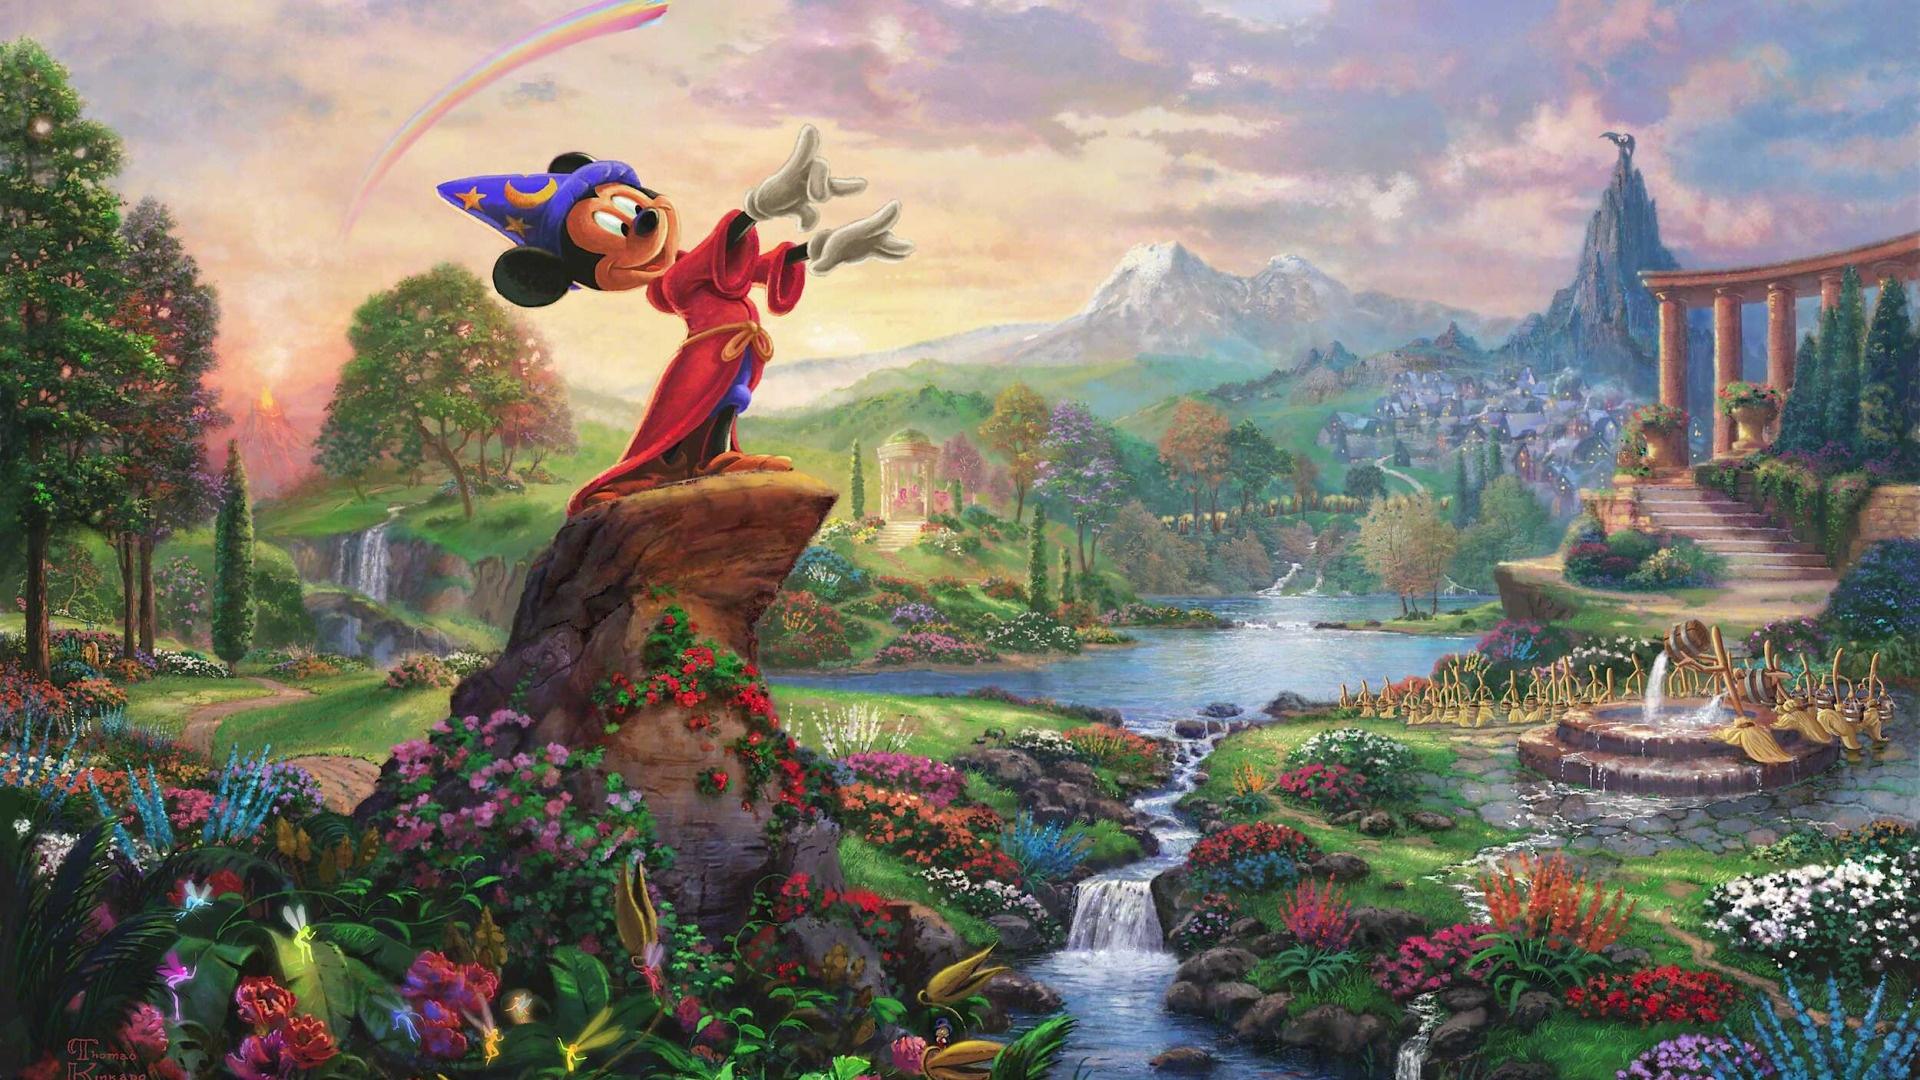 Disney cool wallpaper